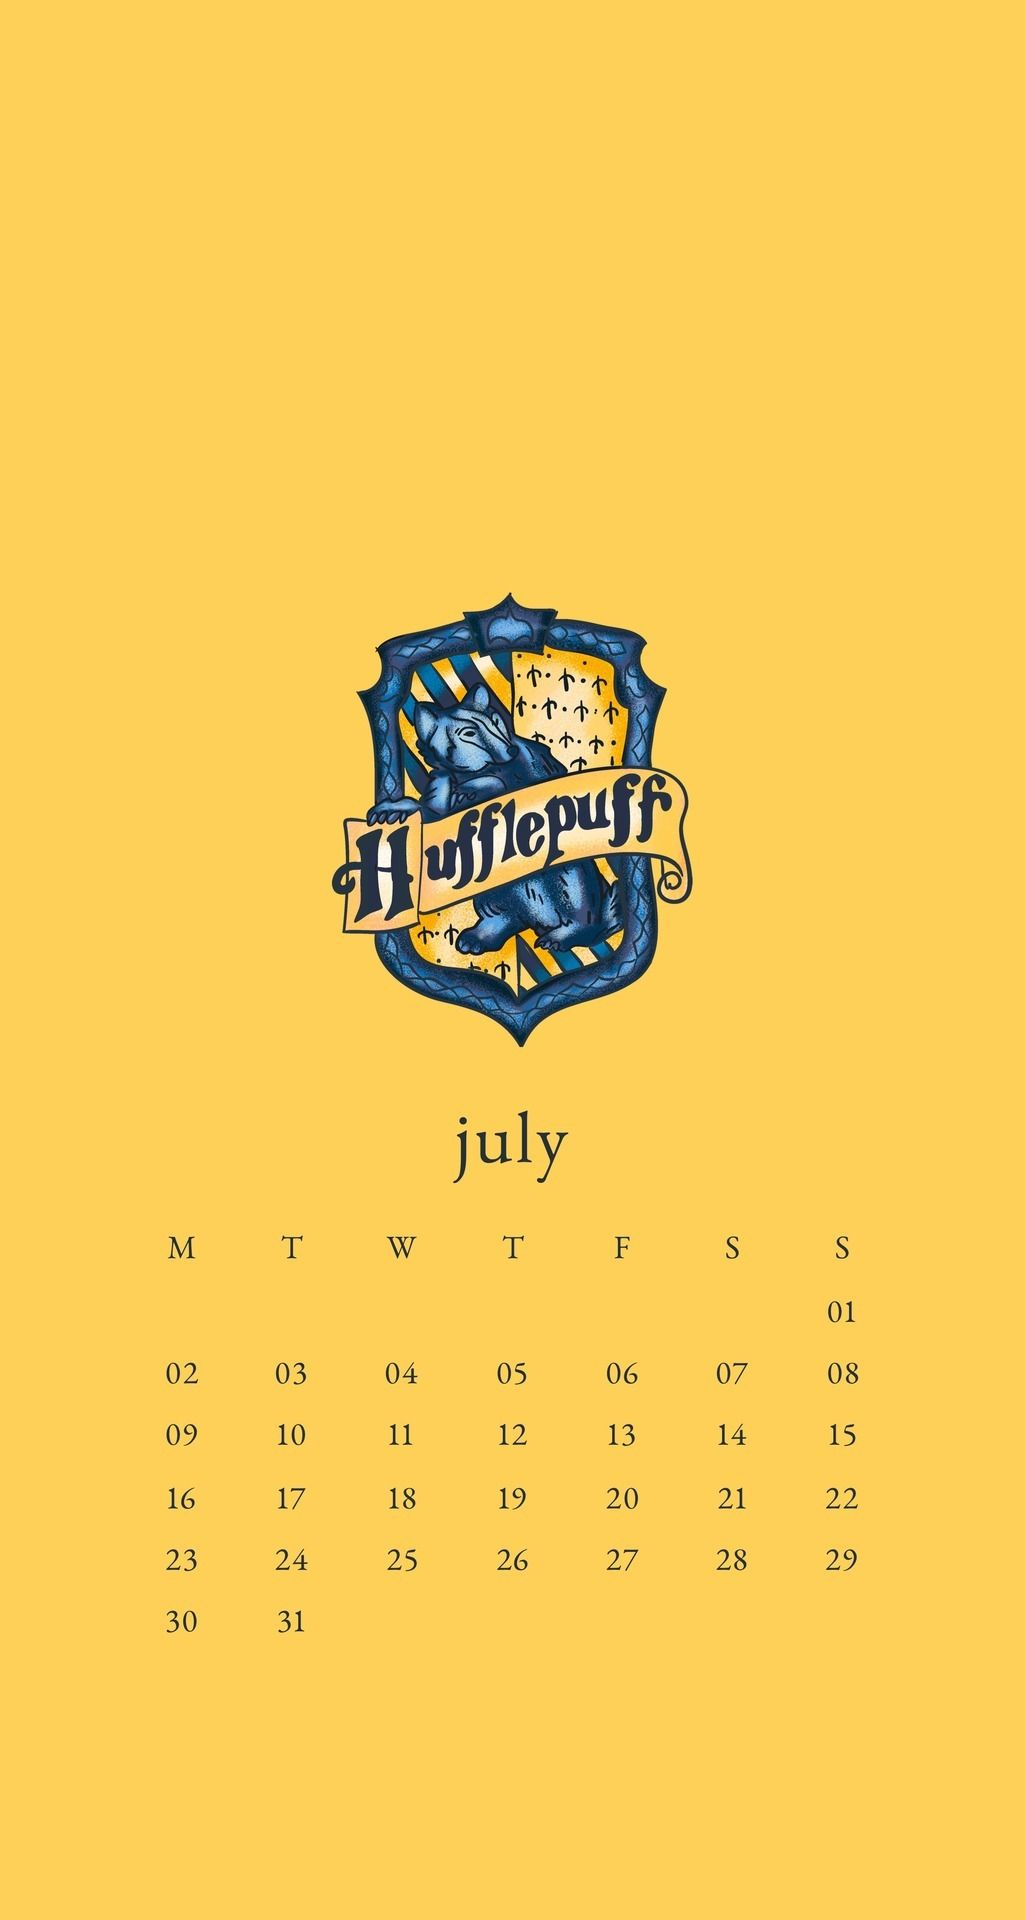 July 2018 Calendar Wallpaper Phone Harry Potter Hogwarts Hufflepuff Calendar Wallpaper Harry Potter Wallpaper Harry Potter Hufflepuff